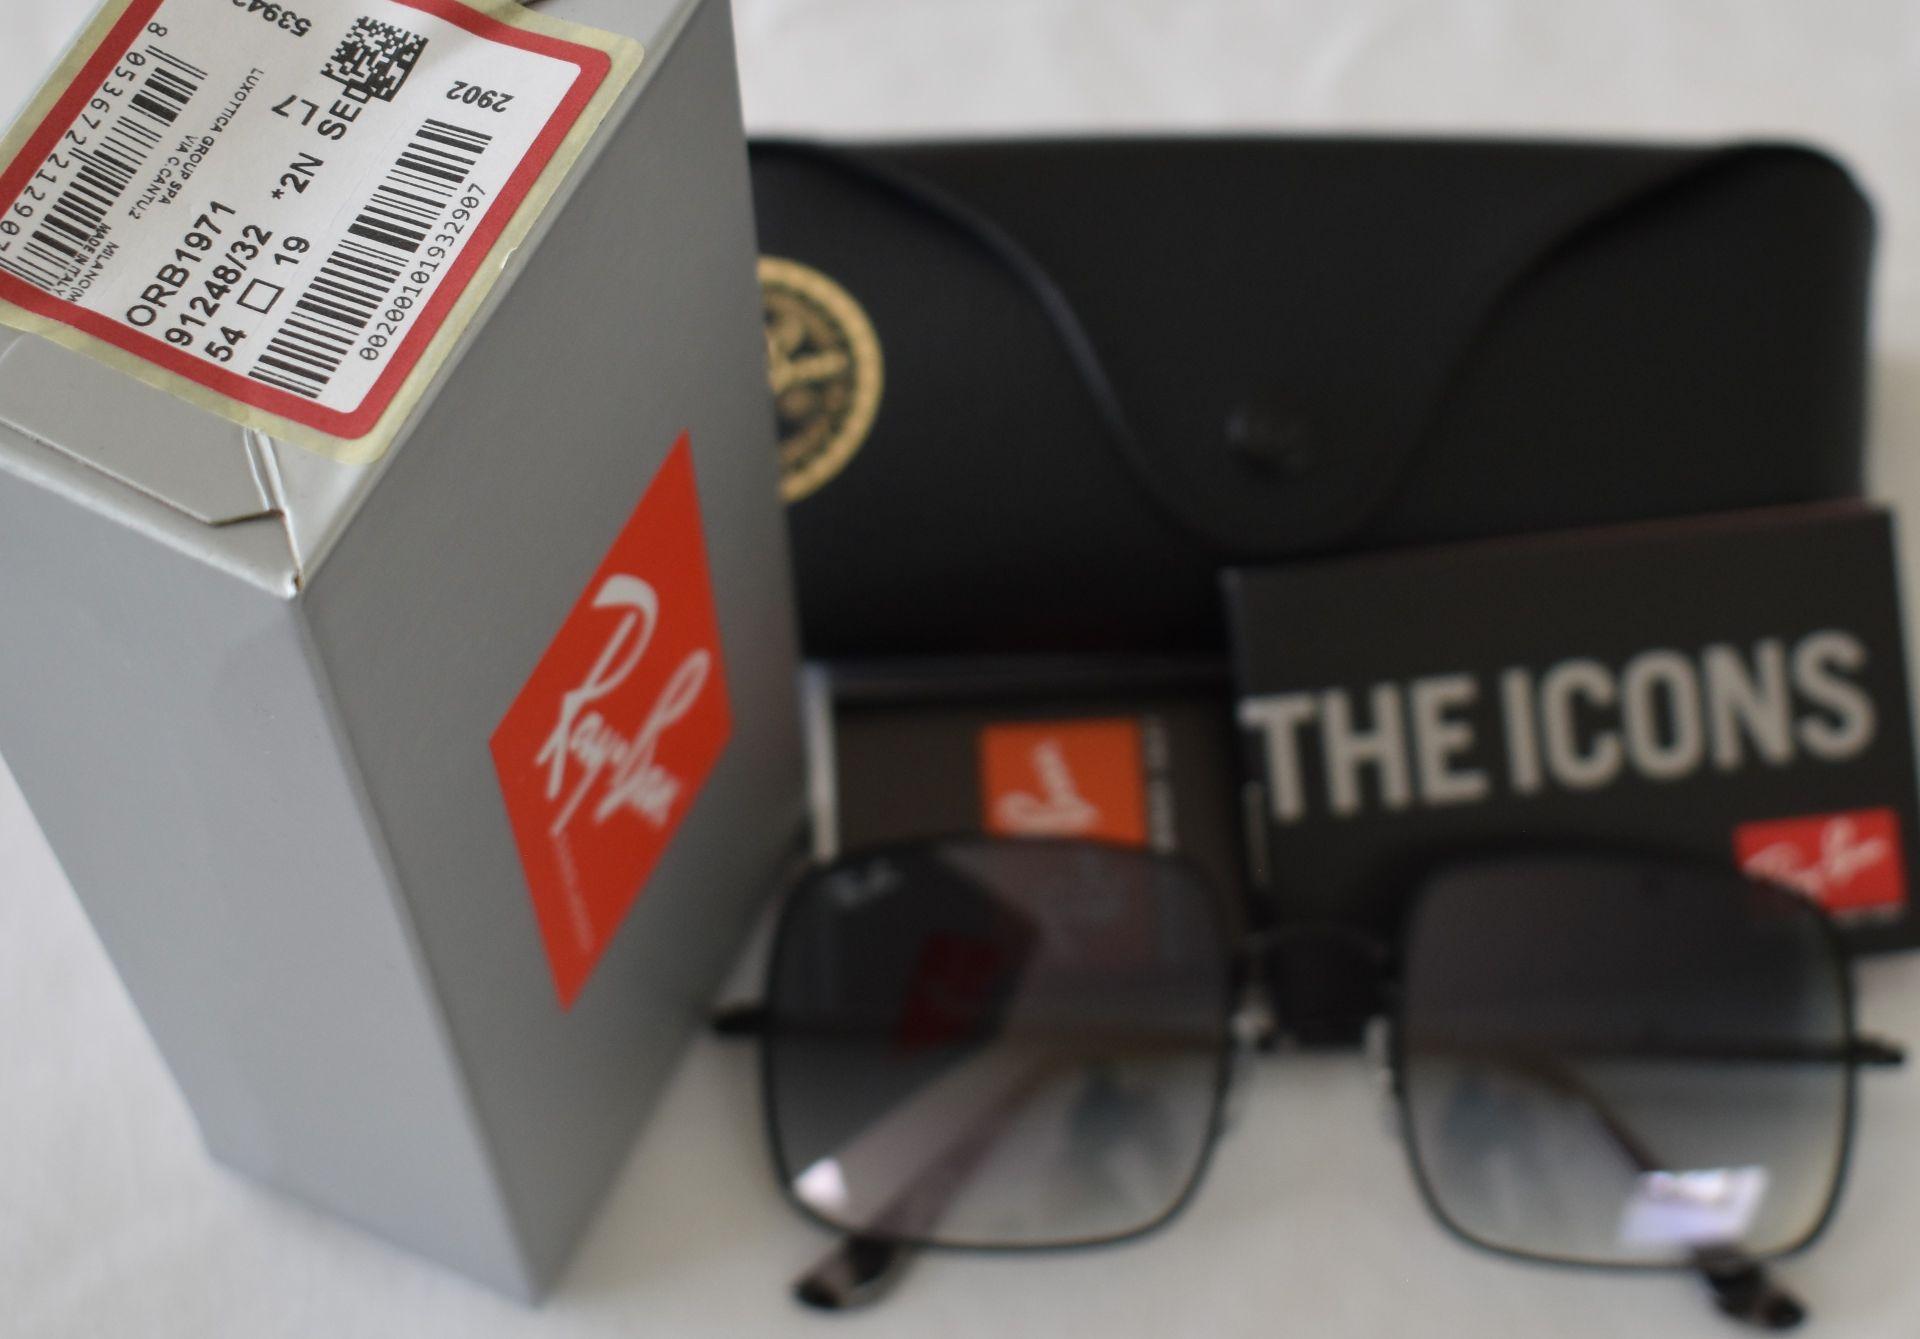 Ray Ban Sunglasses ORB1971 91248/32 *2N - Image 2 of 2